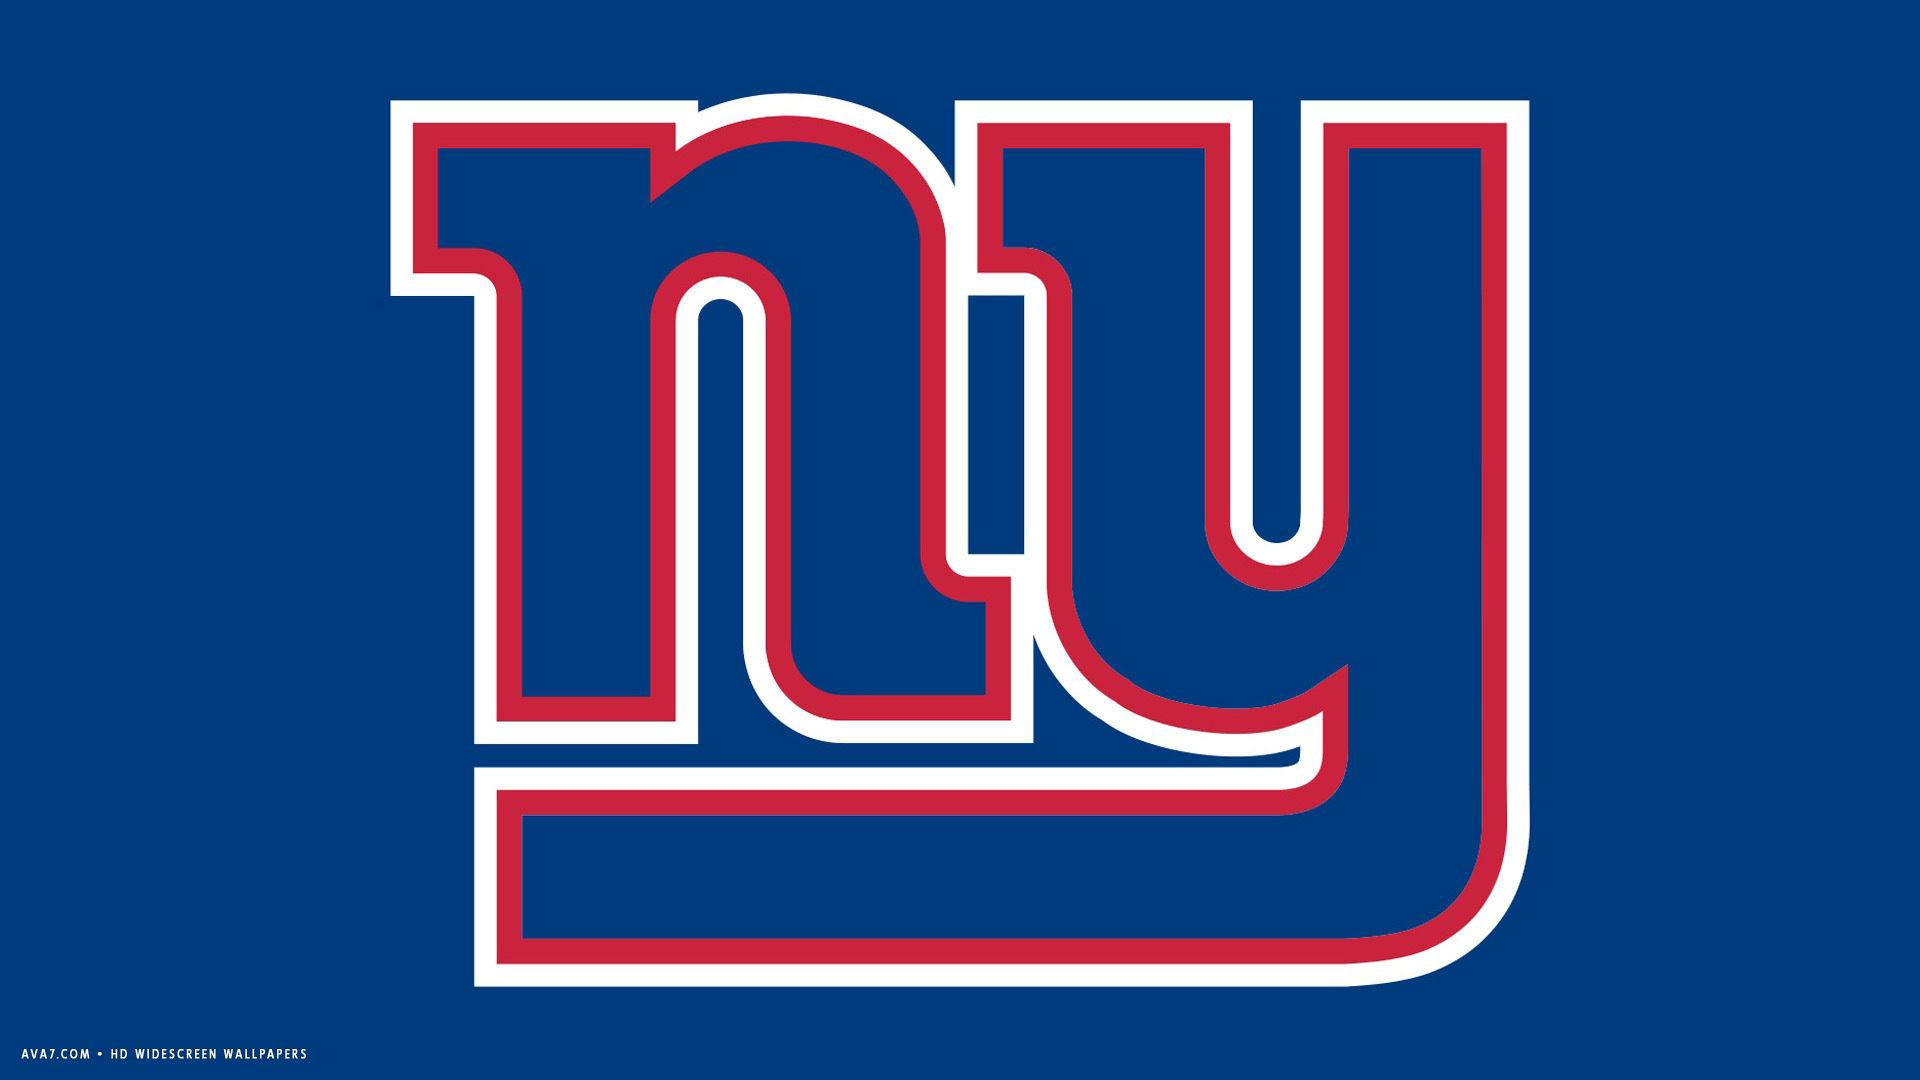 Ny Giants Logo Hd Wallpaper Hd Widescreen Wallpaper New York Giants Logo Hd 1920x1080 Wallpaper Teahub Io